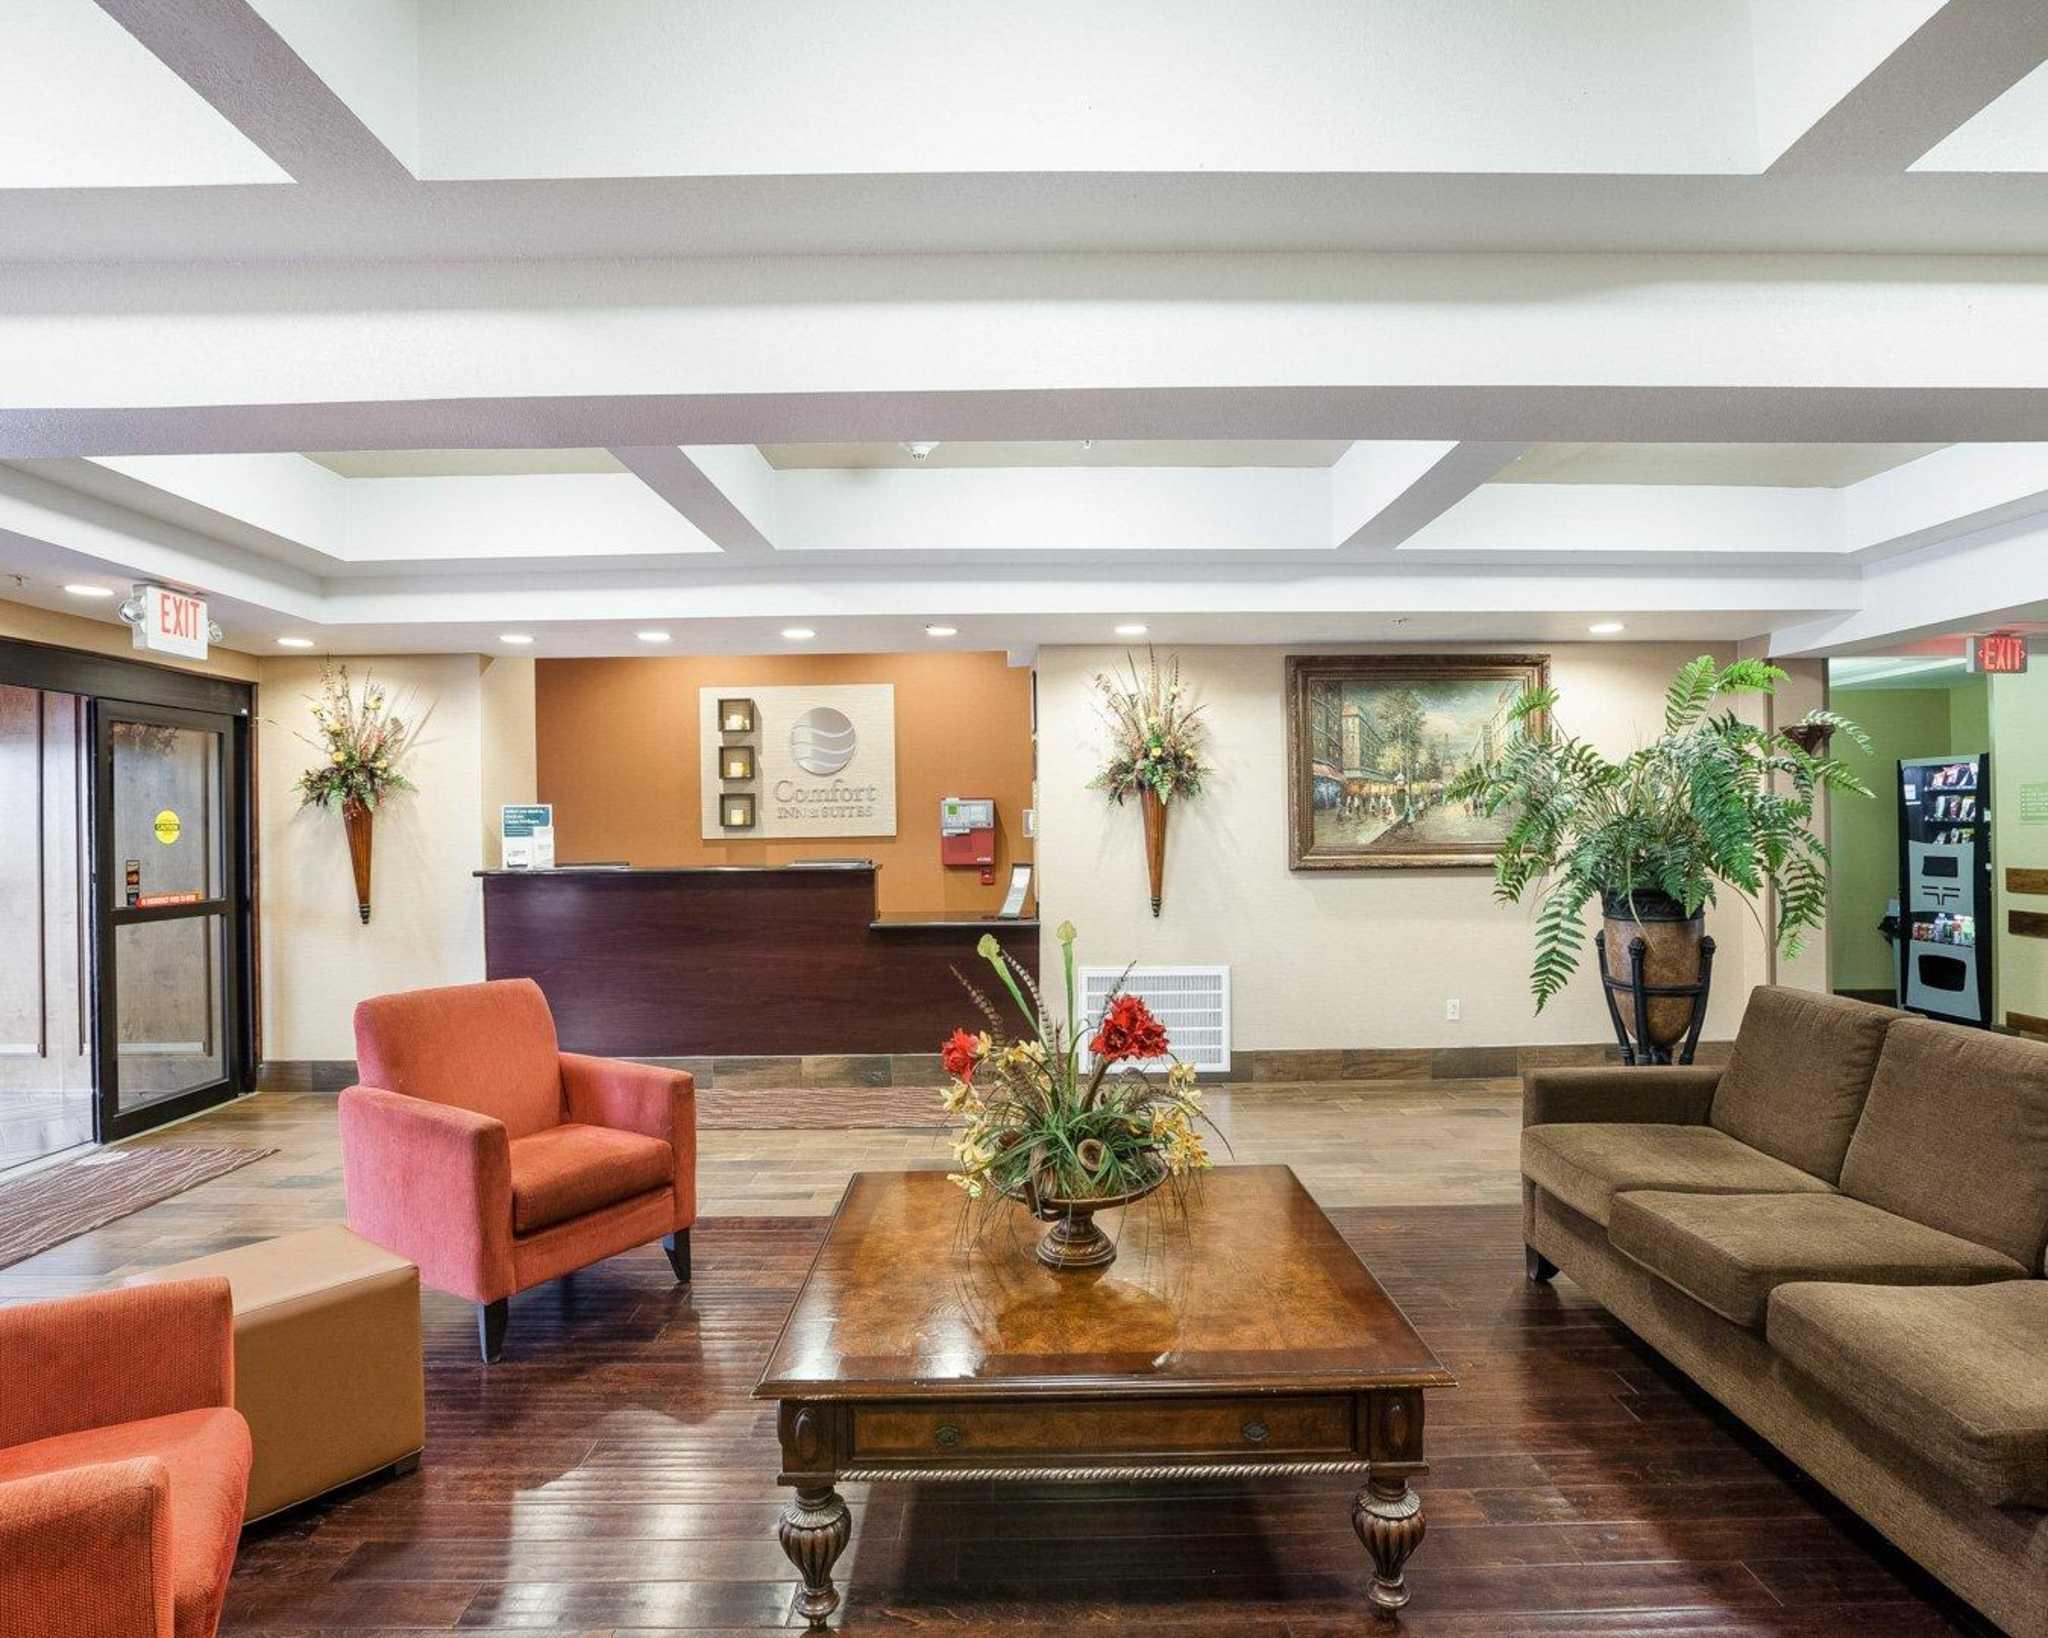 Comfort Inn & Suites Near Medical Center image 12